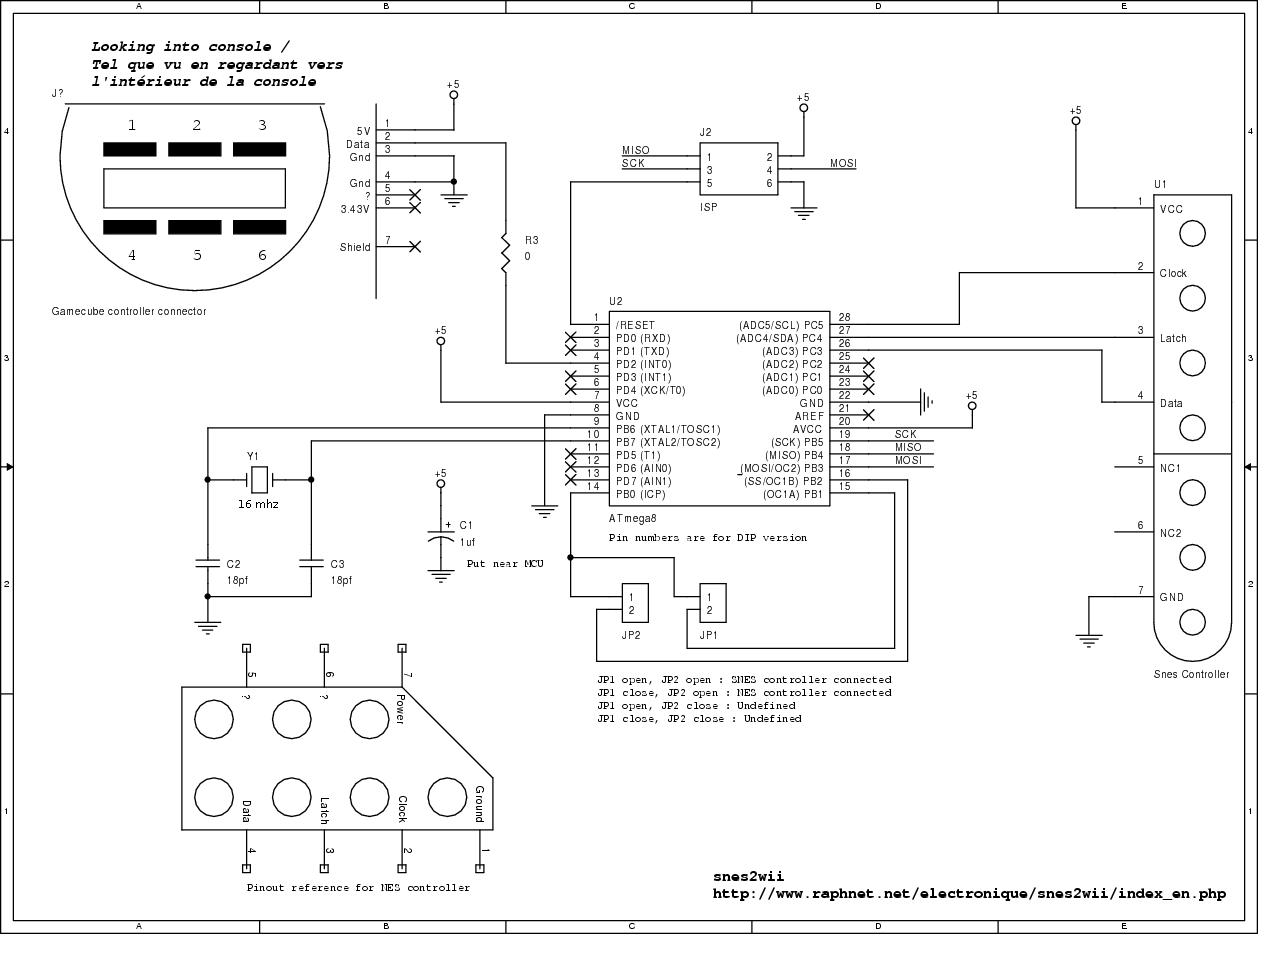 1954 Jaguar Wiring Diagram Schematics Corvette Xk120 Schematic Diagrams Fender Jazzmaster